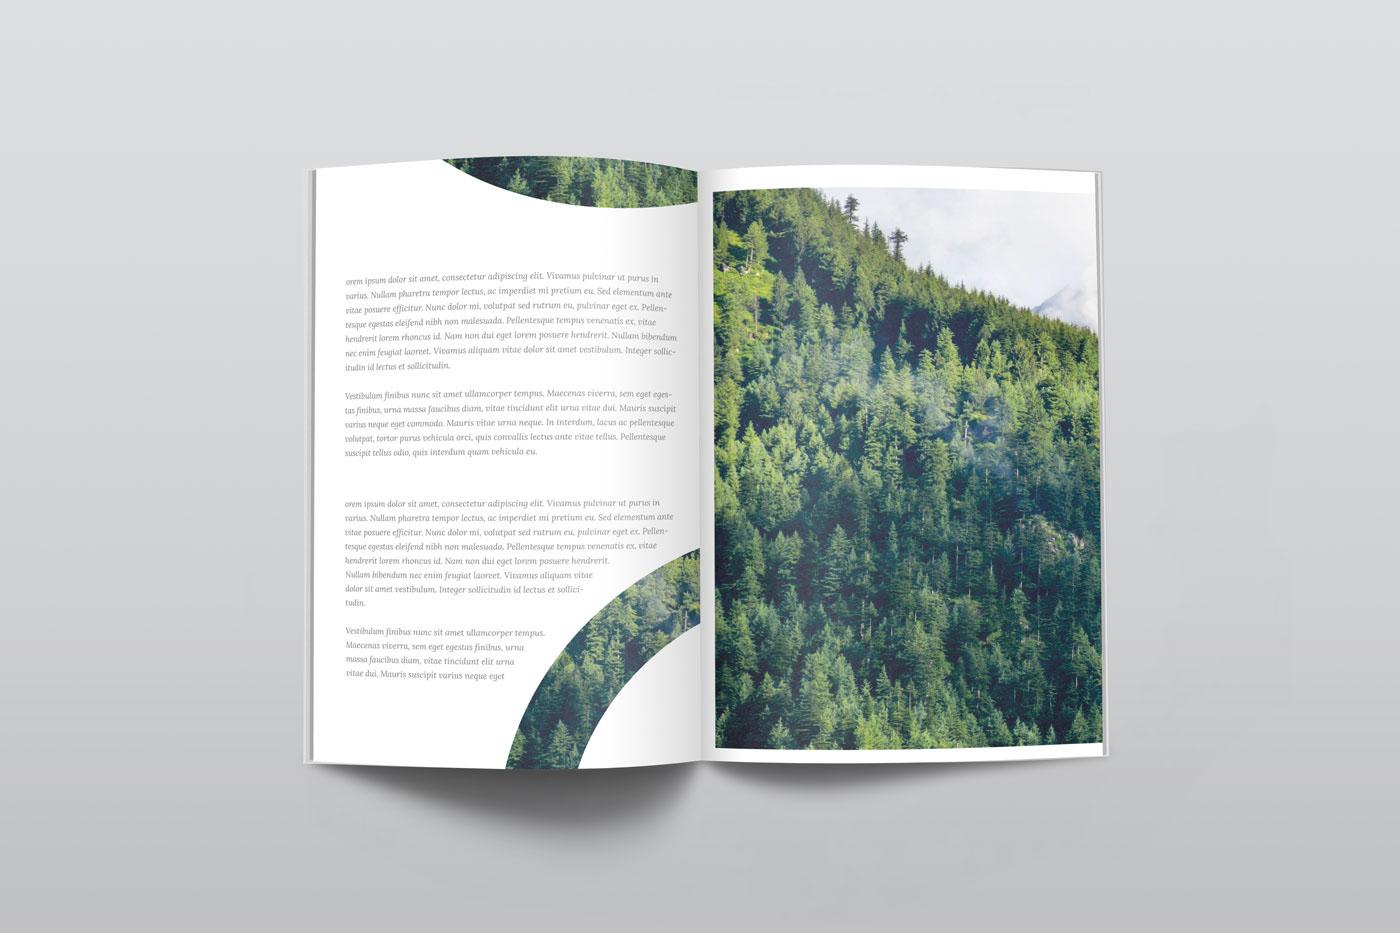 free psd Mockup freebie magazine a4 us letter photoshop free mockup  mock up mock-up flyer paper book